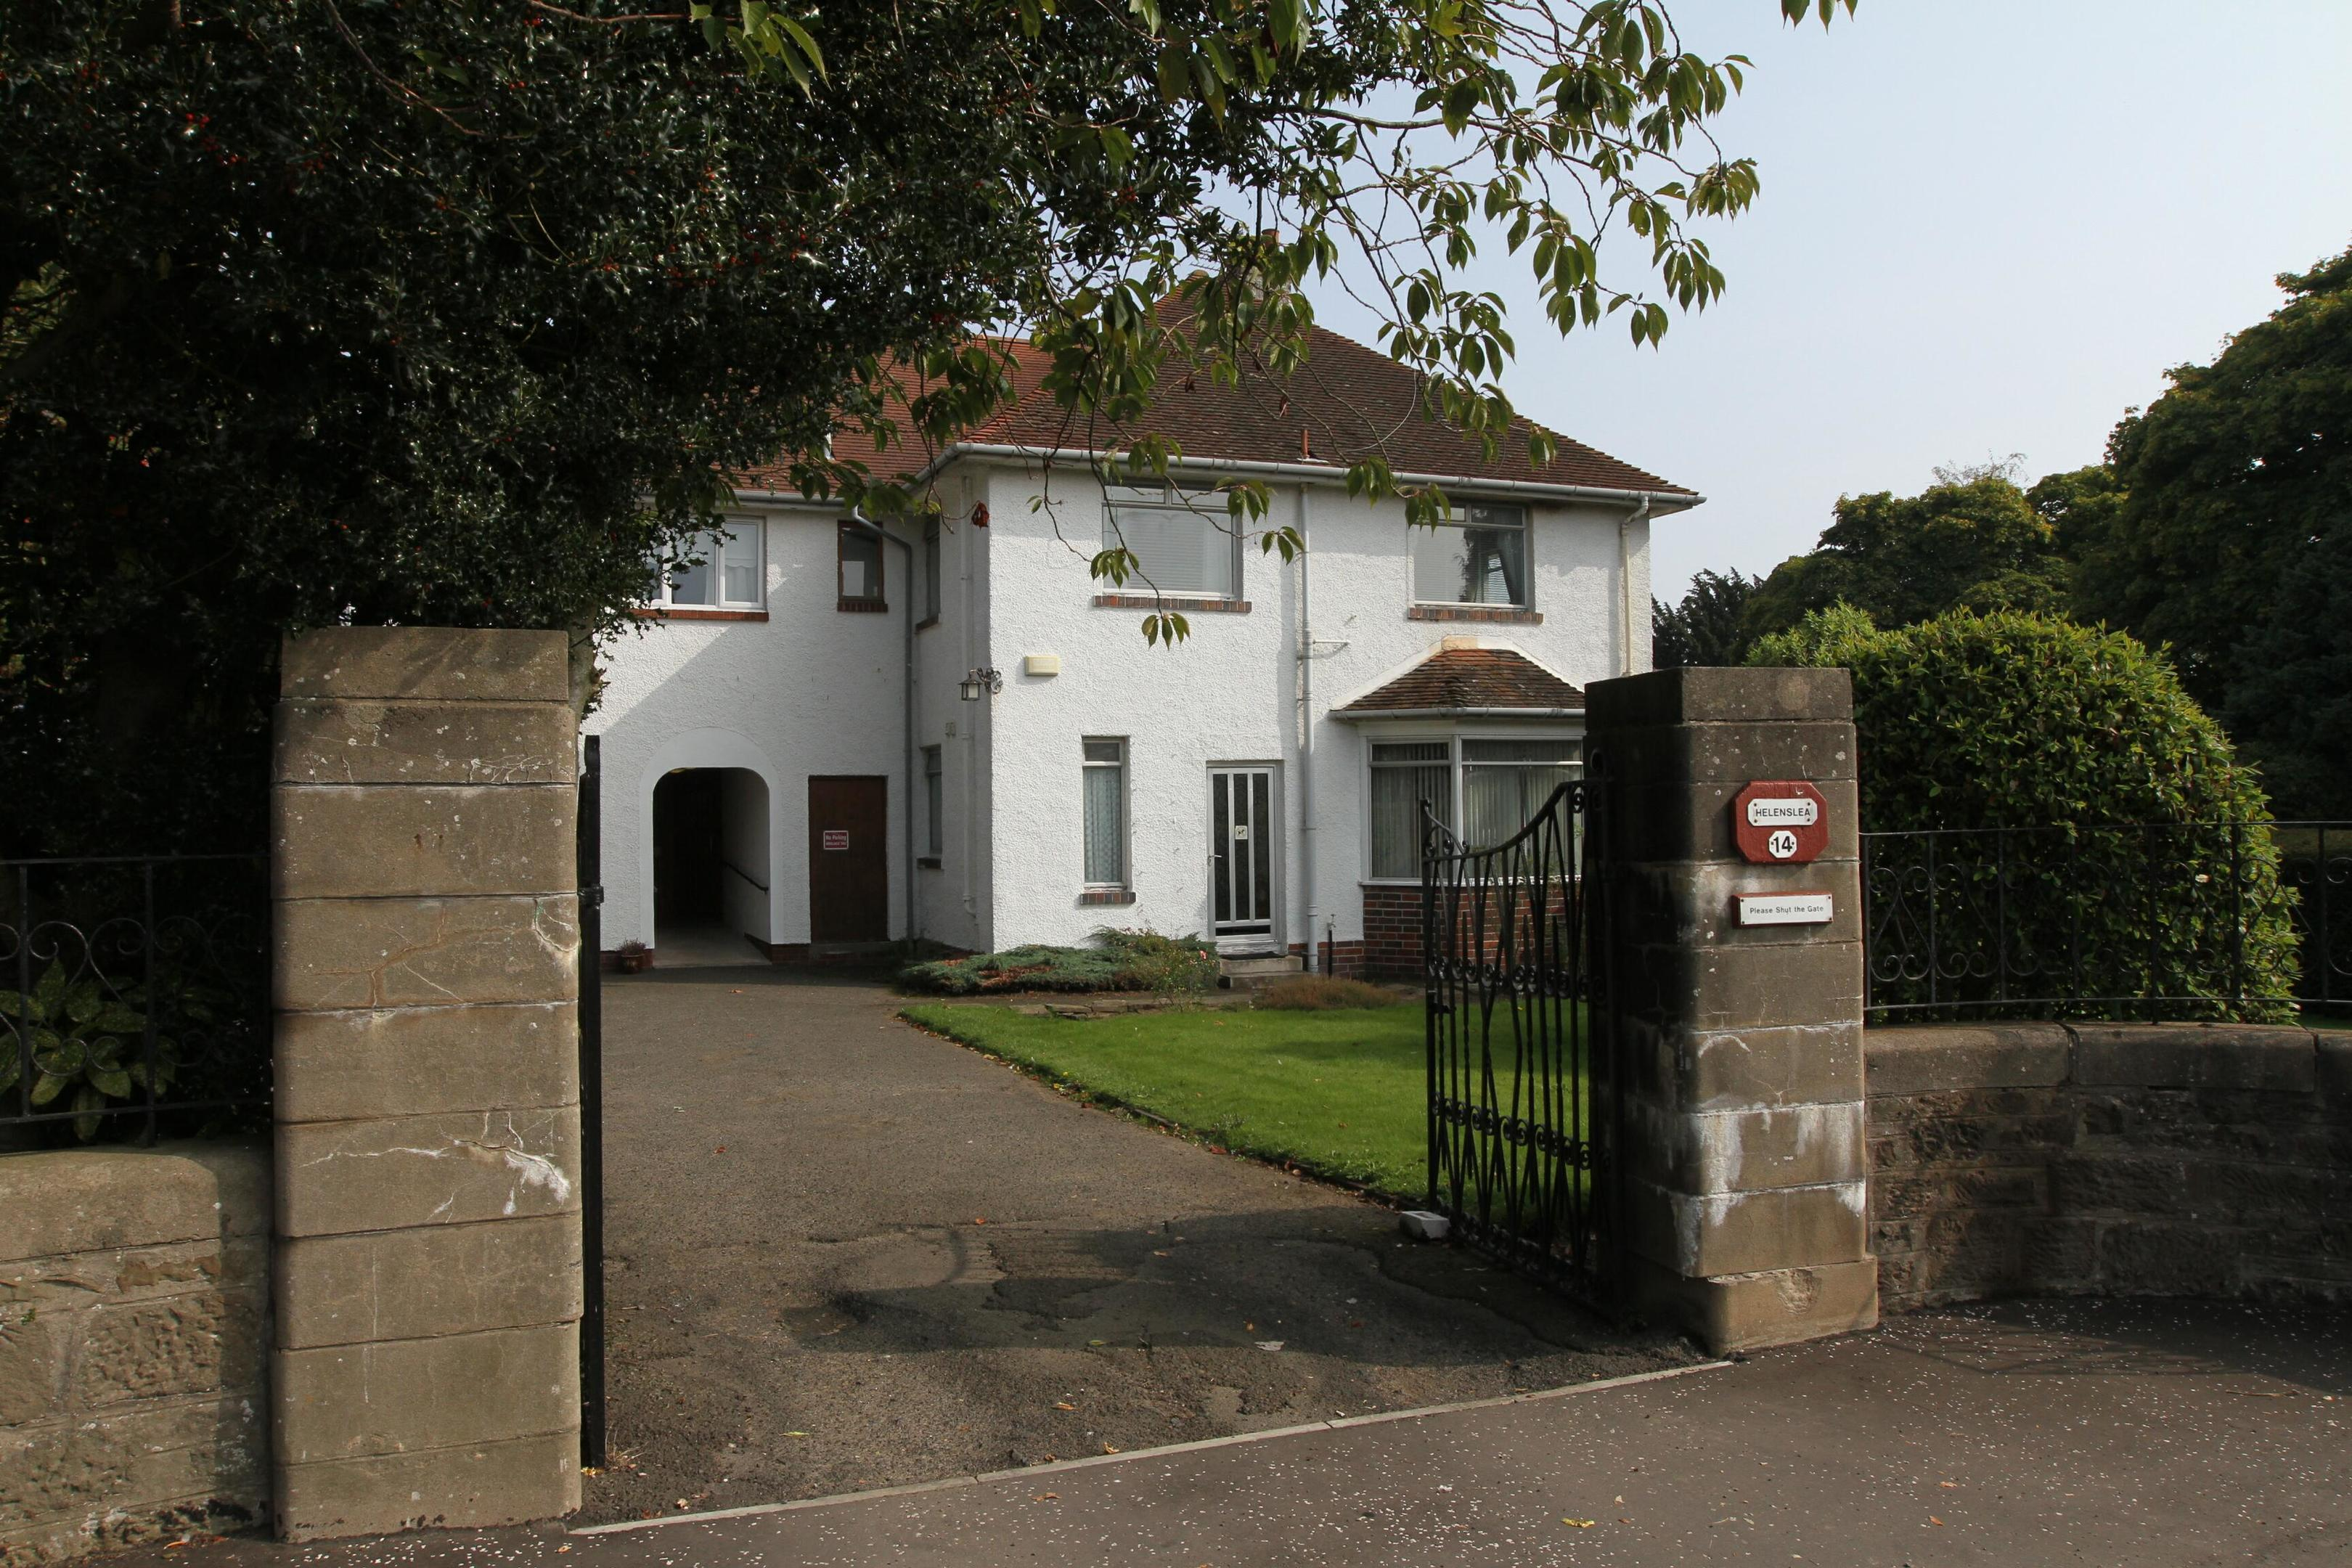 Helenslea Care Home